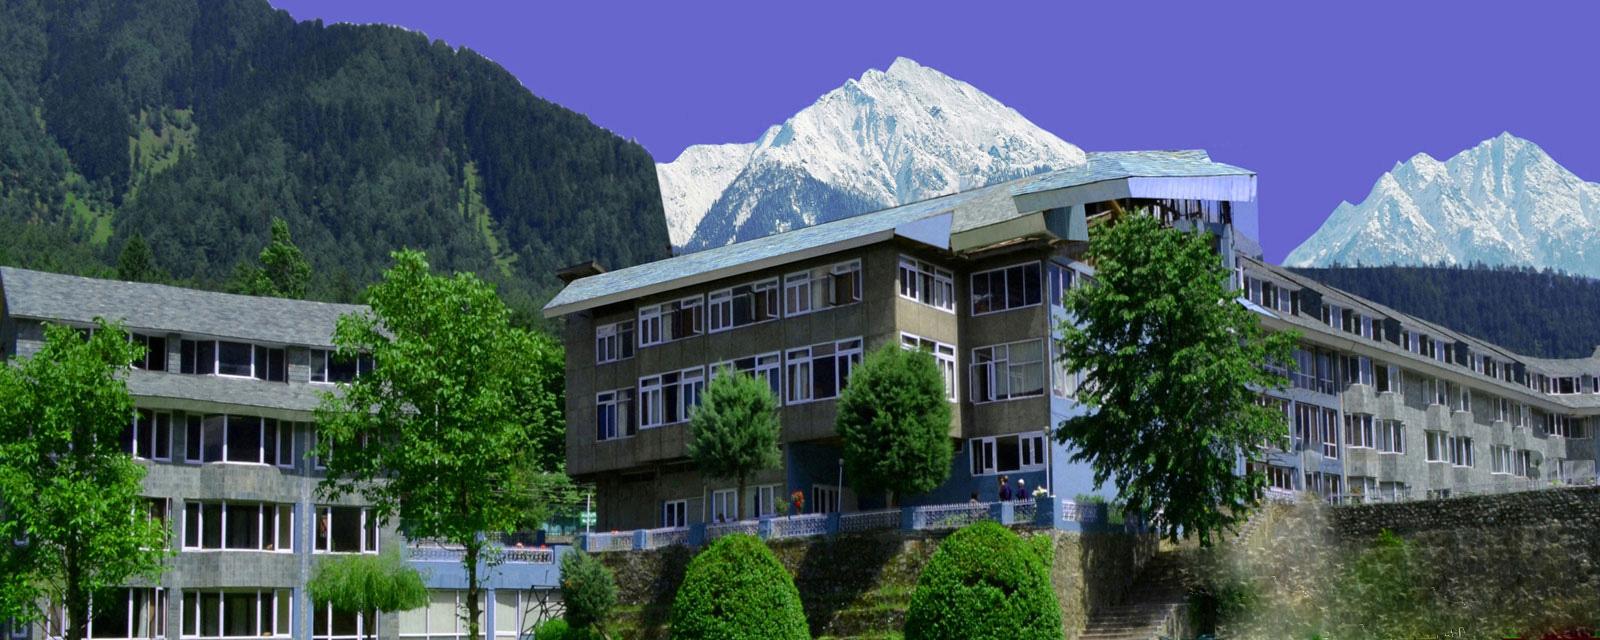 Hotel Woodstock, Pahalgam, Kashmir, India